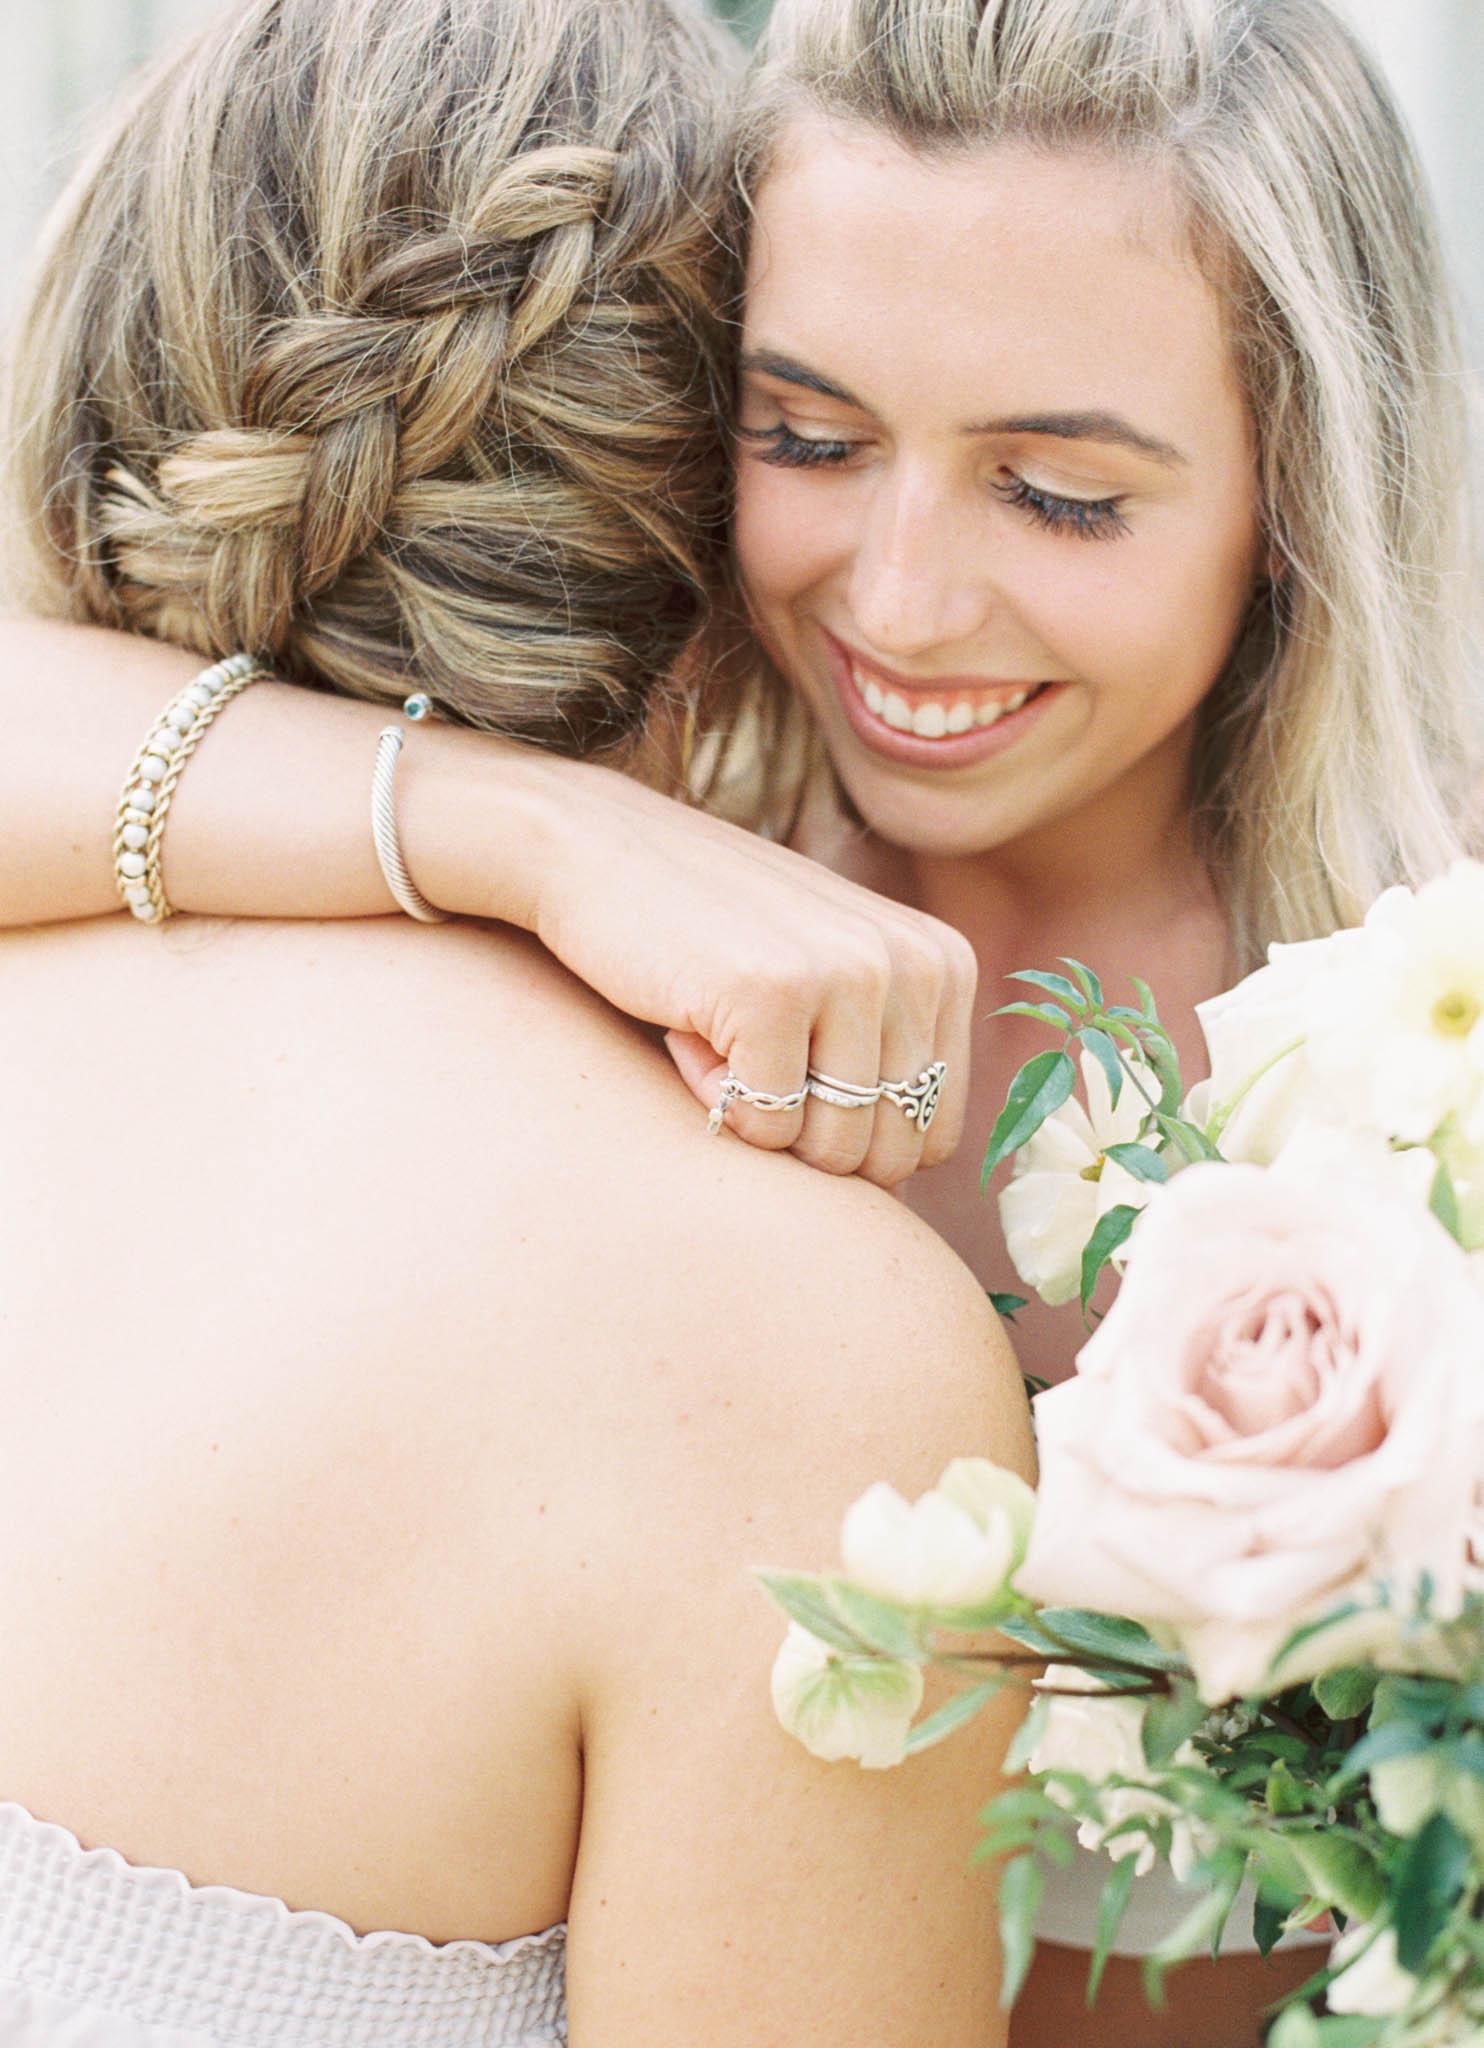 Rosemary Beach wedding spring pastels